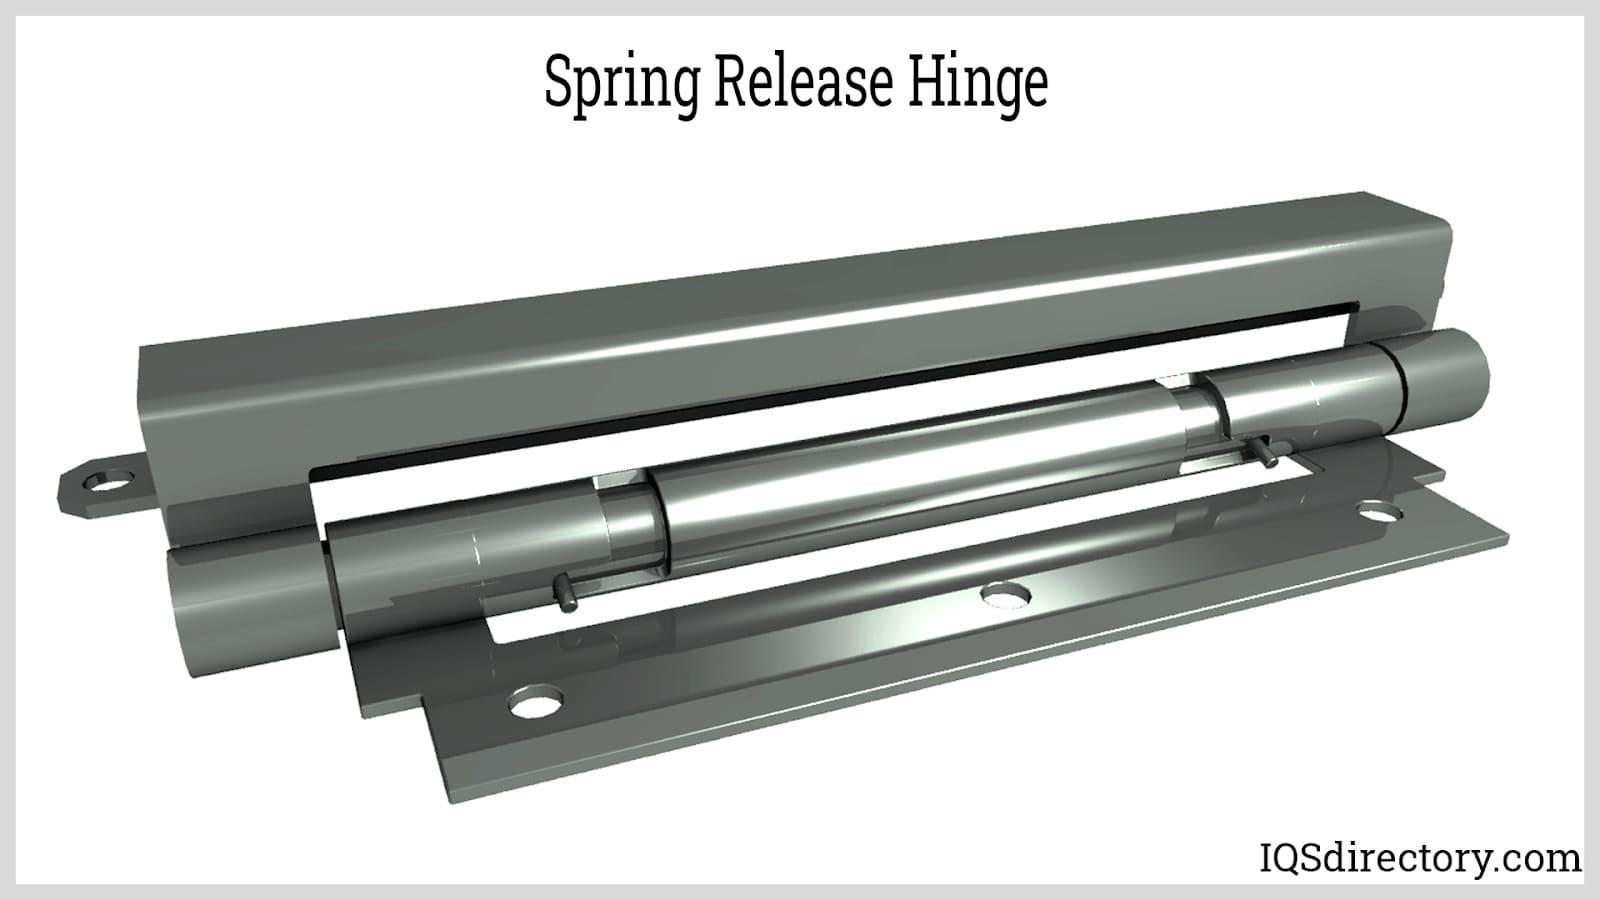 Spring Release Hinge